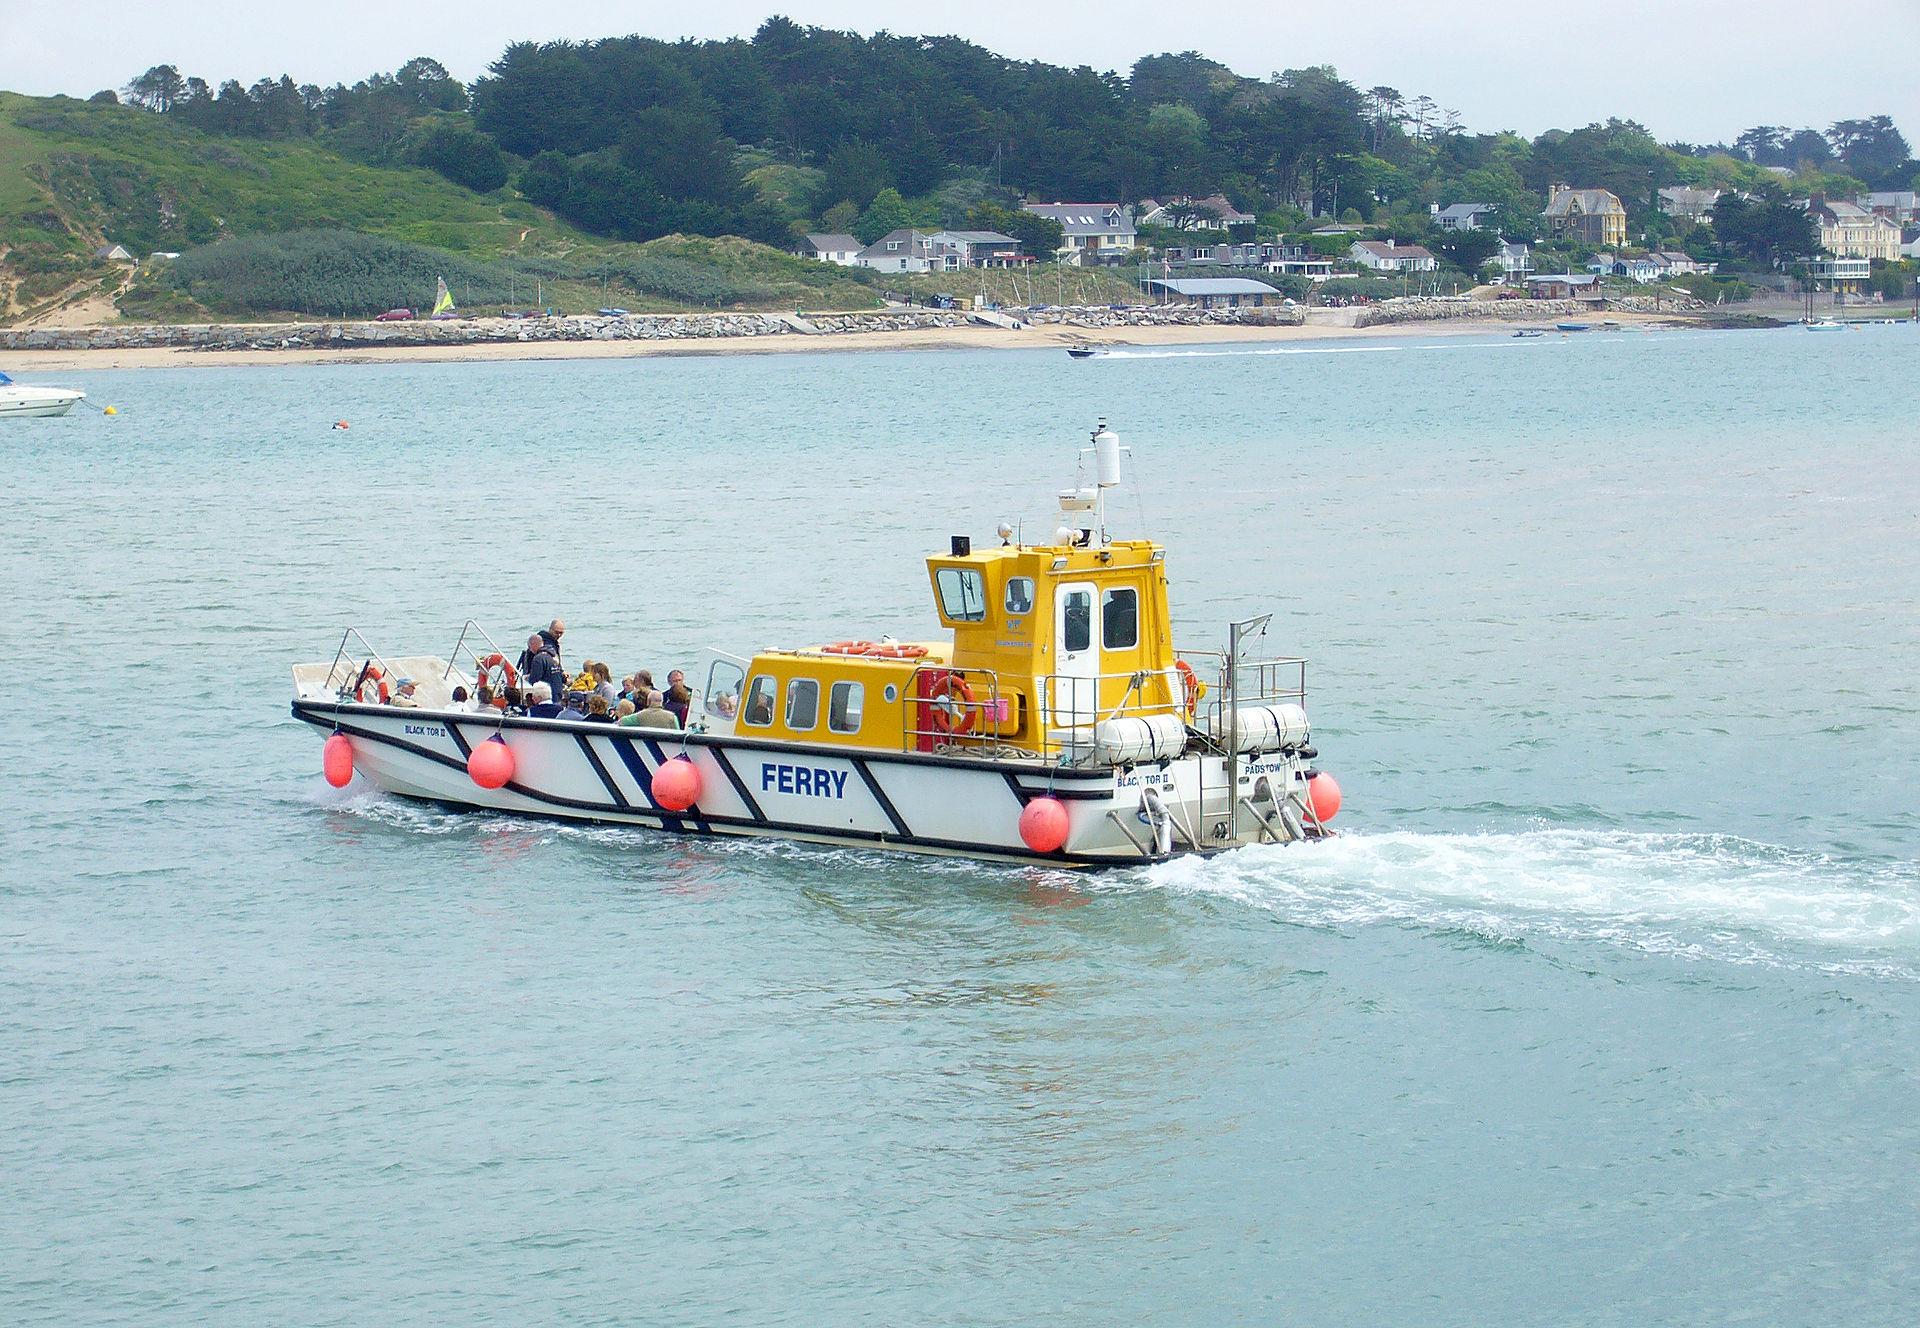 ferry approaching Rock, England